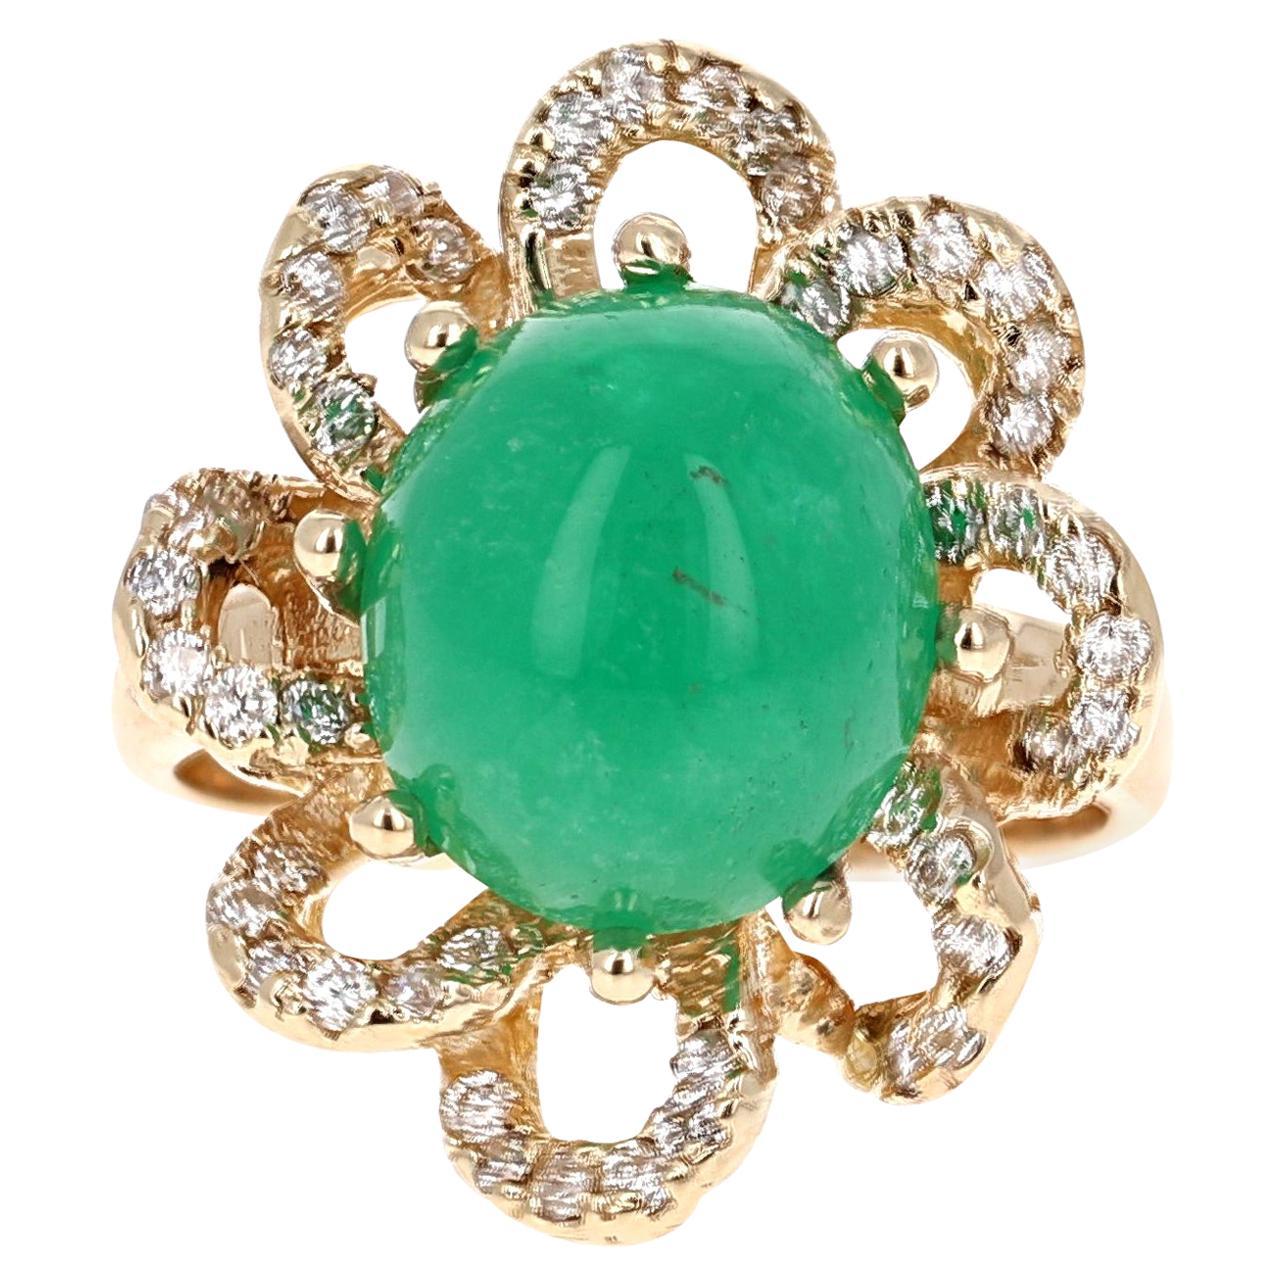 6.24 Carat Emerald Diamond 14 Karat Yellow Gold Cocktail Ring